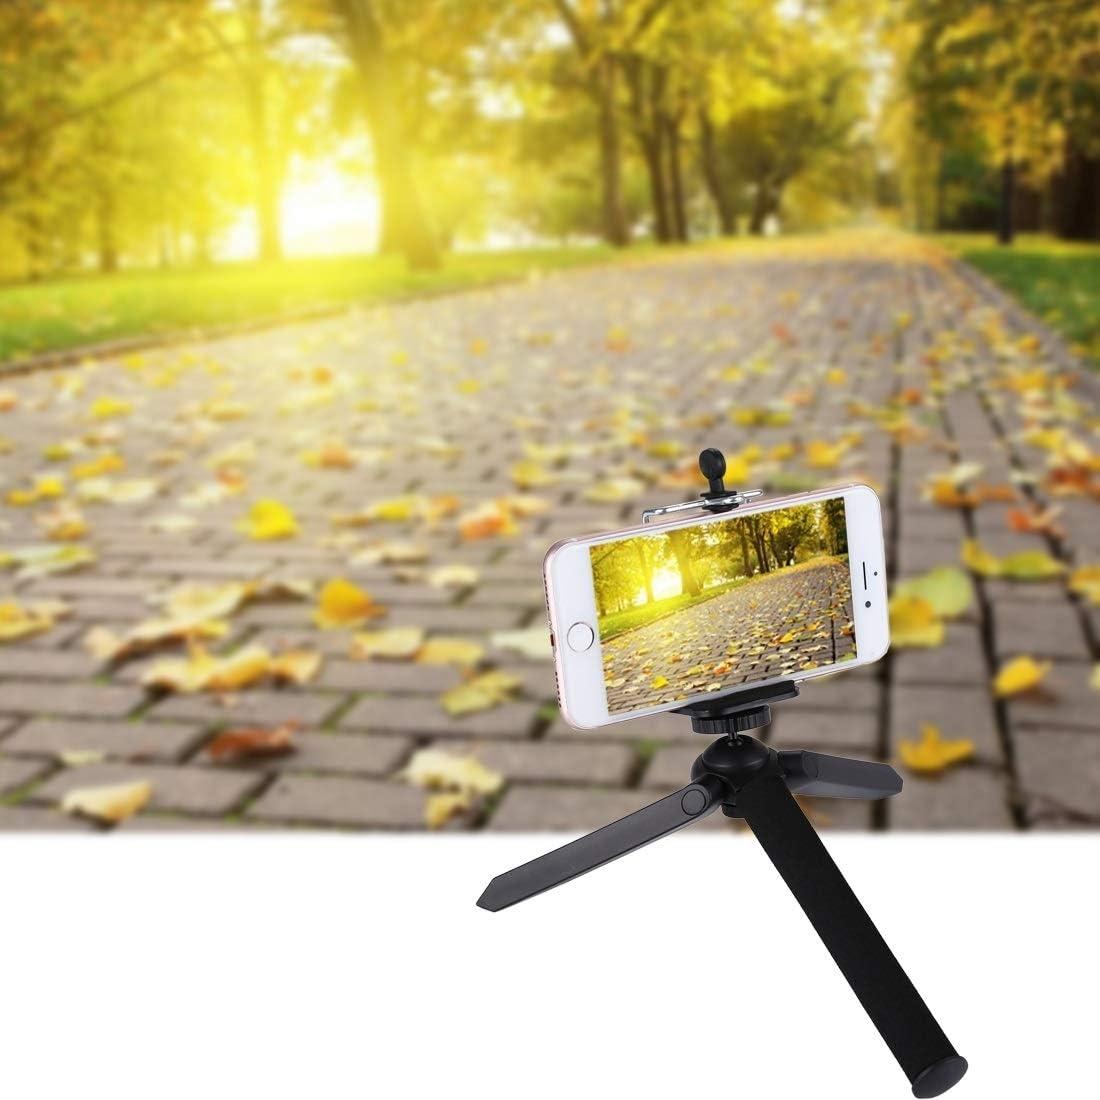 GoPro Sports Cameras MDYHMC AYSMG 2 in 1 Handheld Tripod Self-Portrait Monopod Selfie Stick for Smartphones Digital Cameras